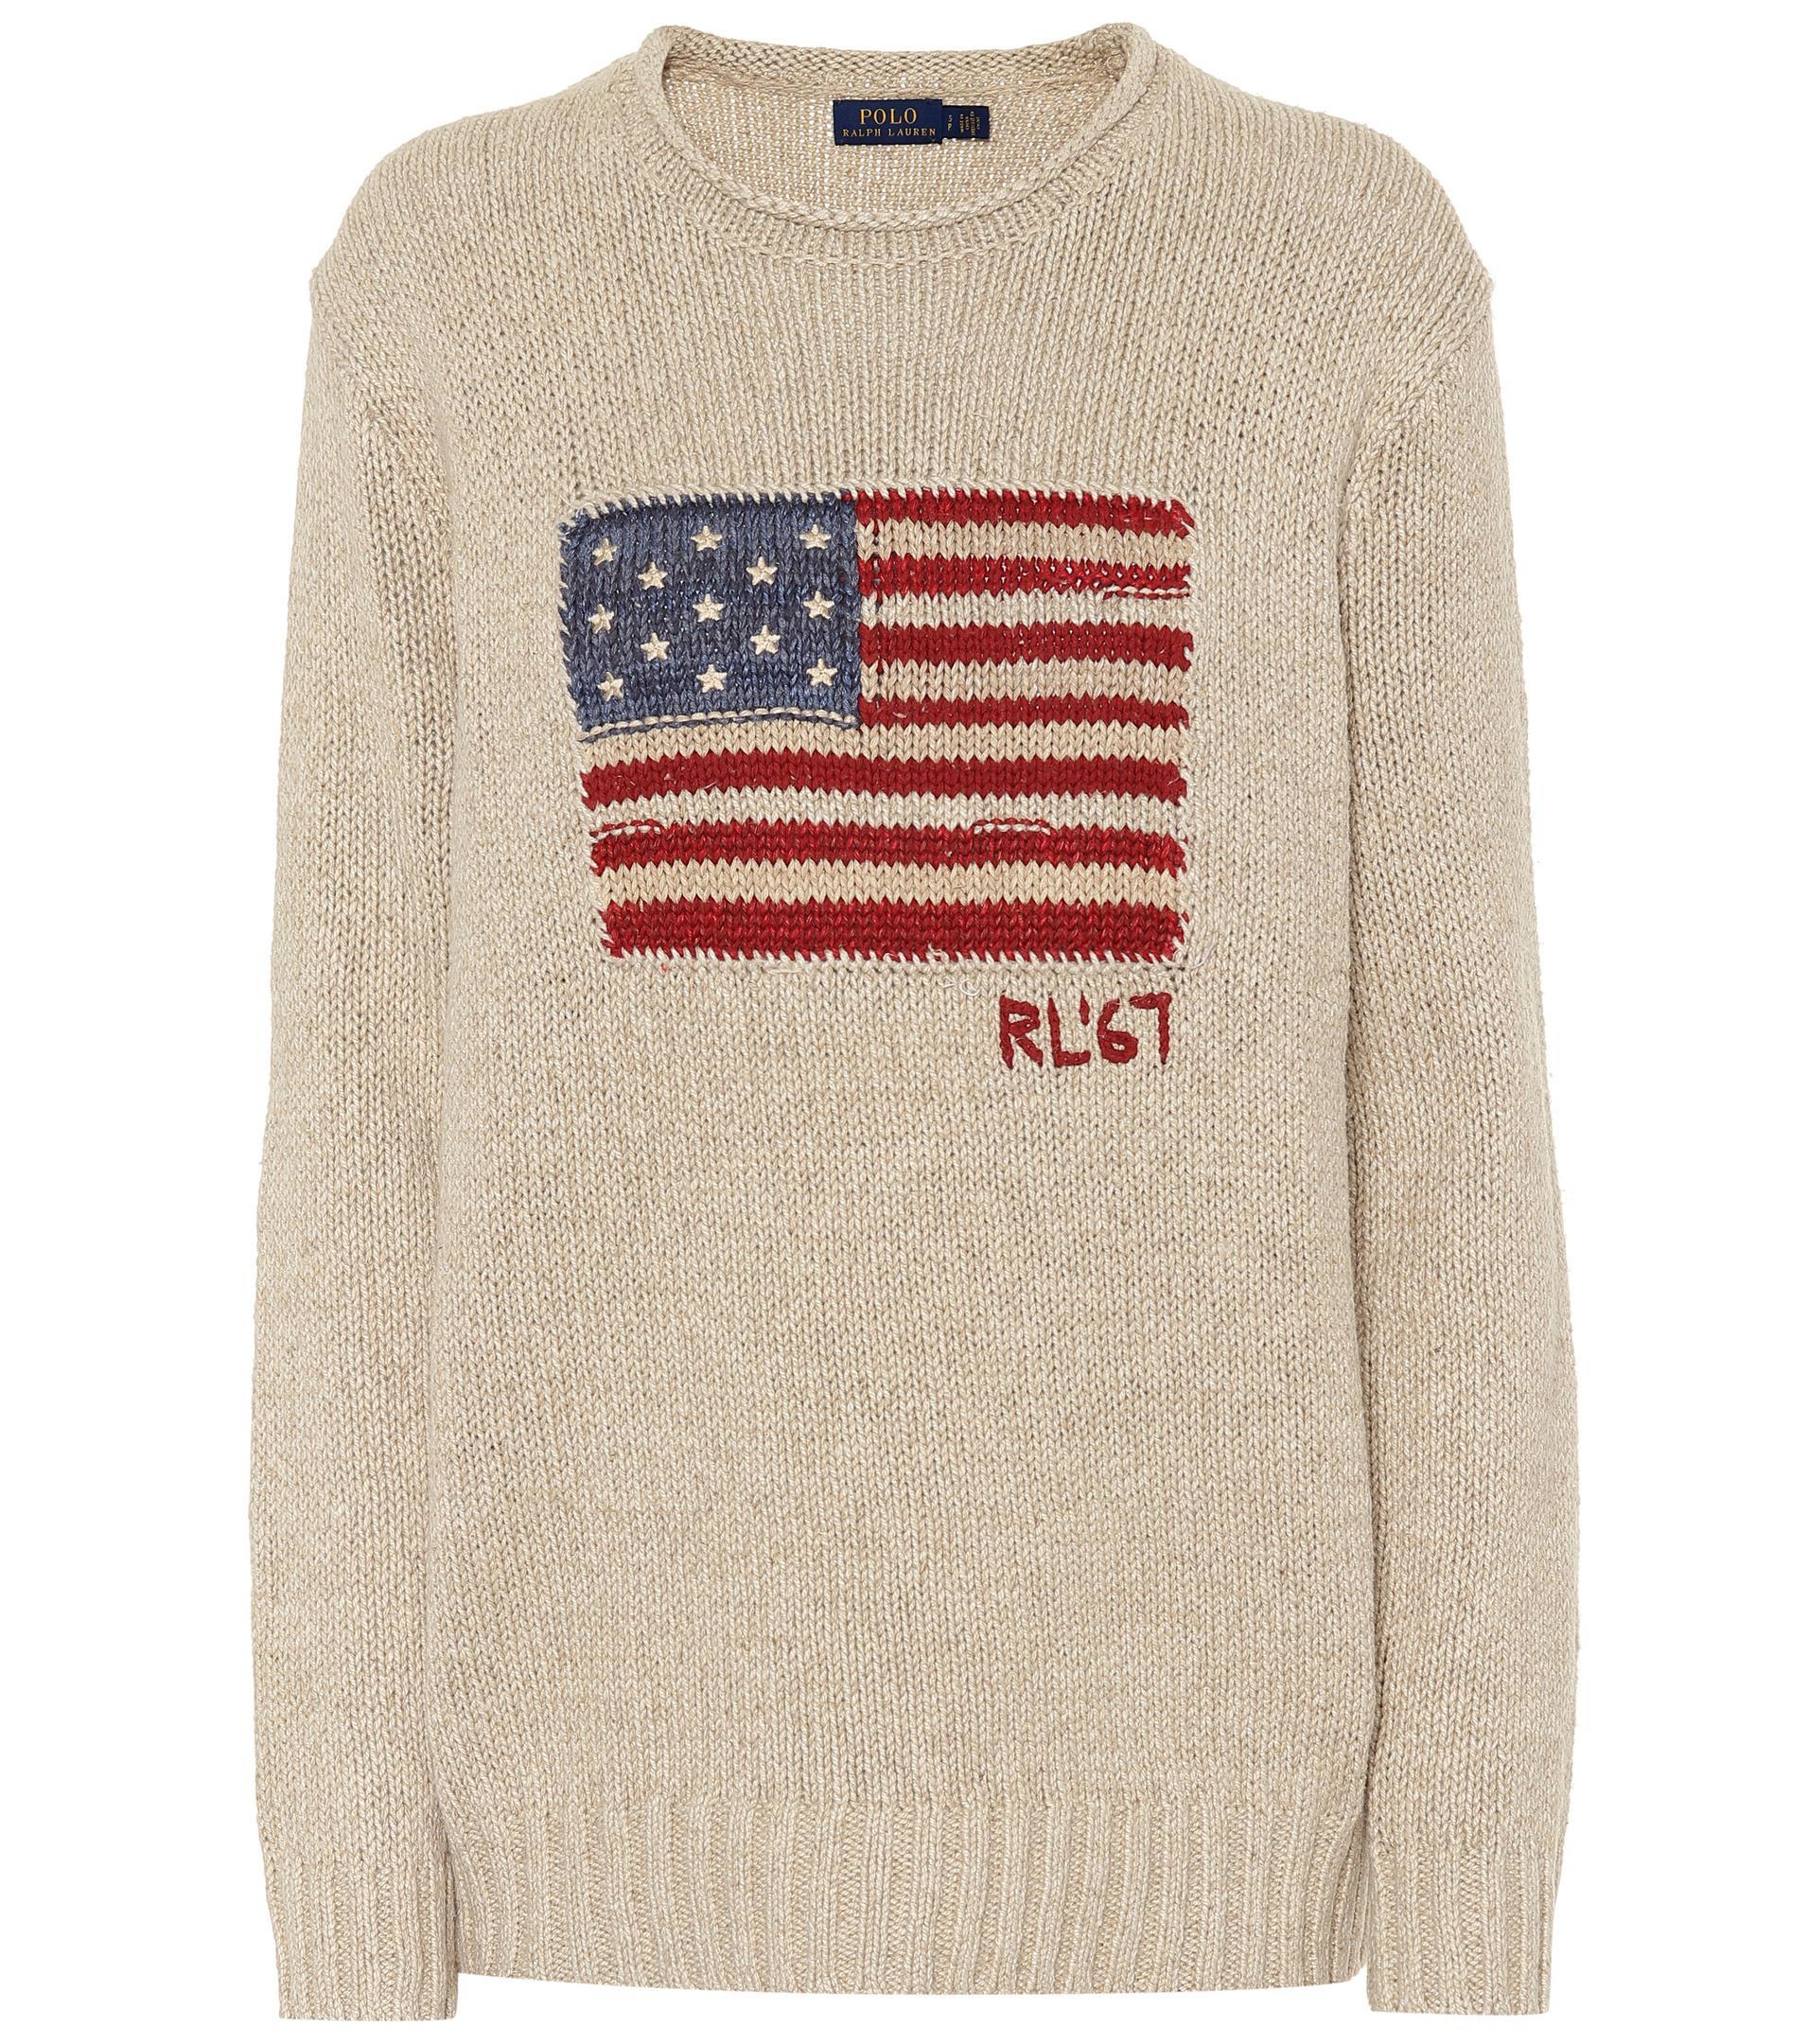 Lyst - Pull intarsia en lin et coton mélangés Polo Ralph Lauren en ... 293a5009522